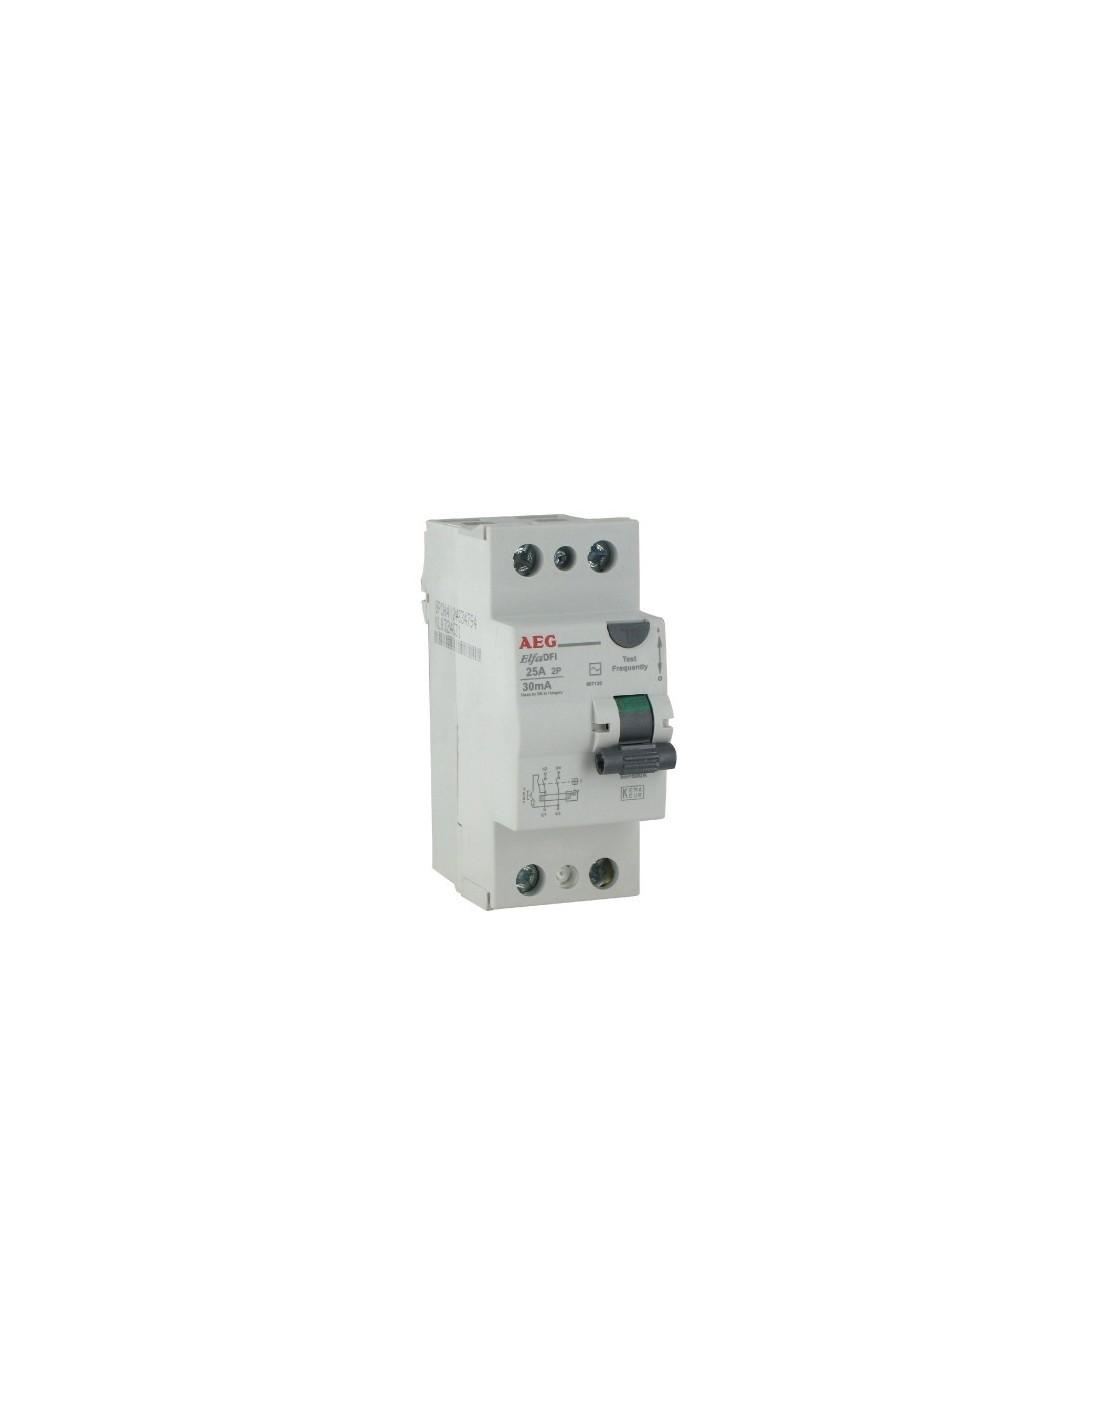 Interrupteur diff rentiel type ac vg 25 2 - Differentiel type a ou ac ...